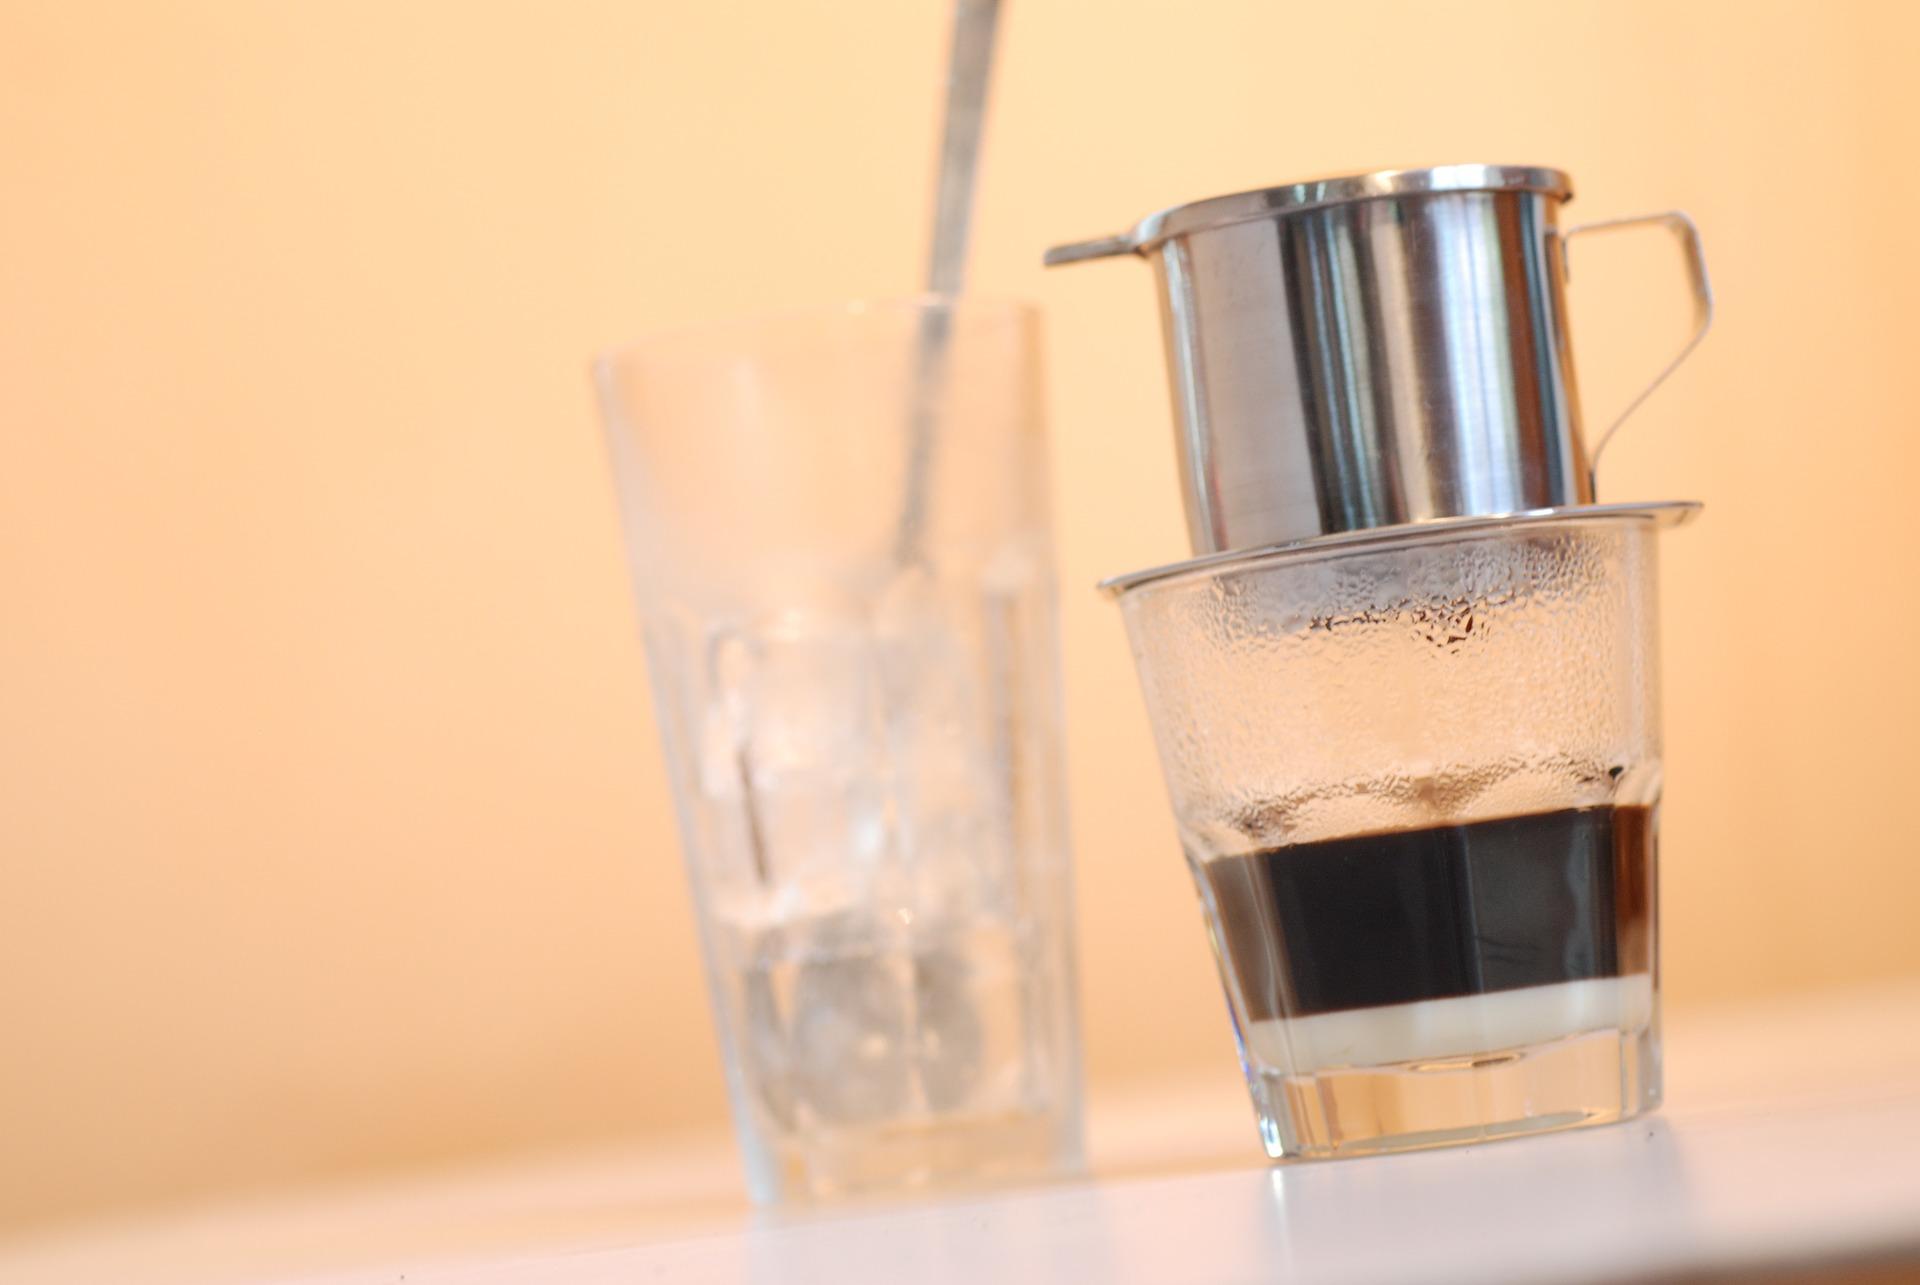 vietnamese-iced-coffee-692896_1920.jpg